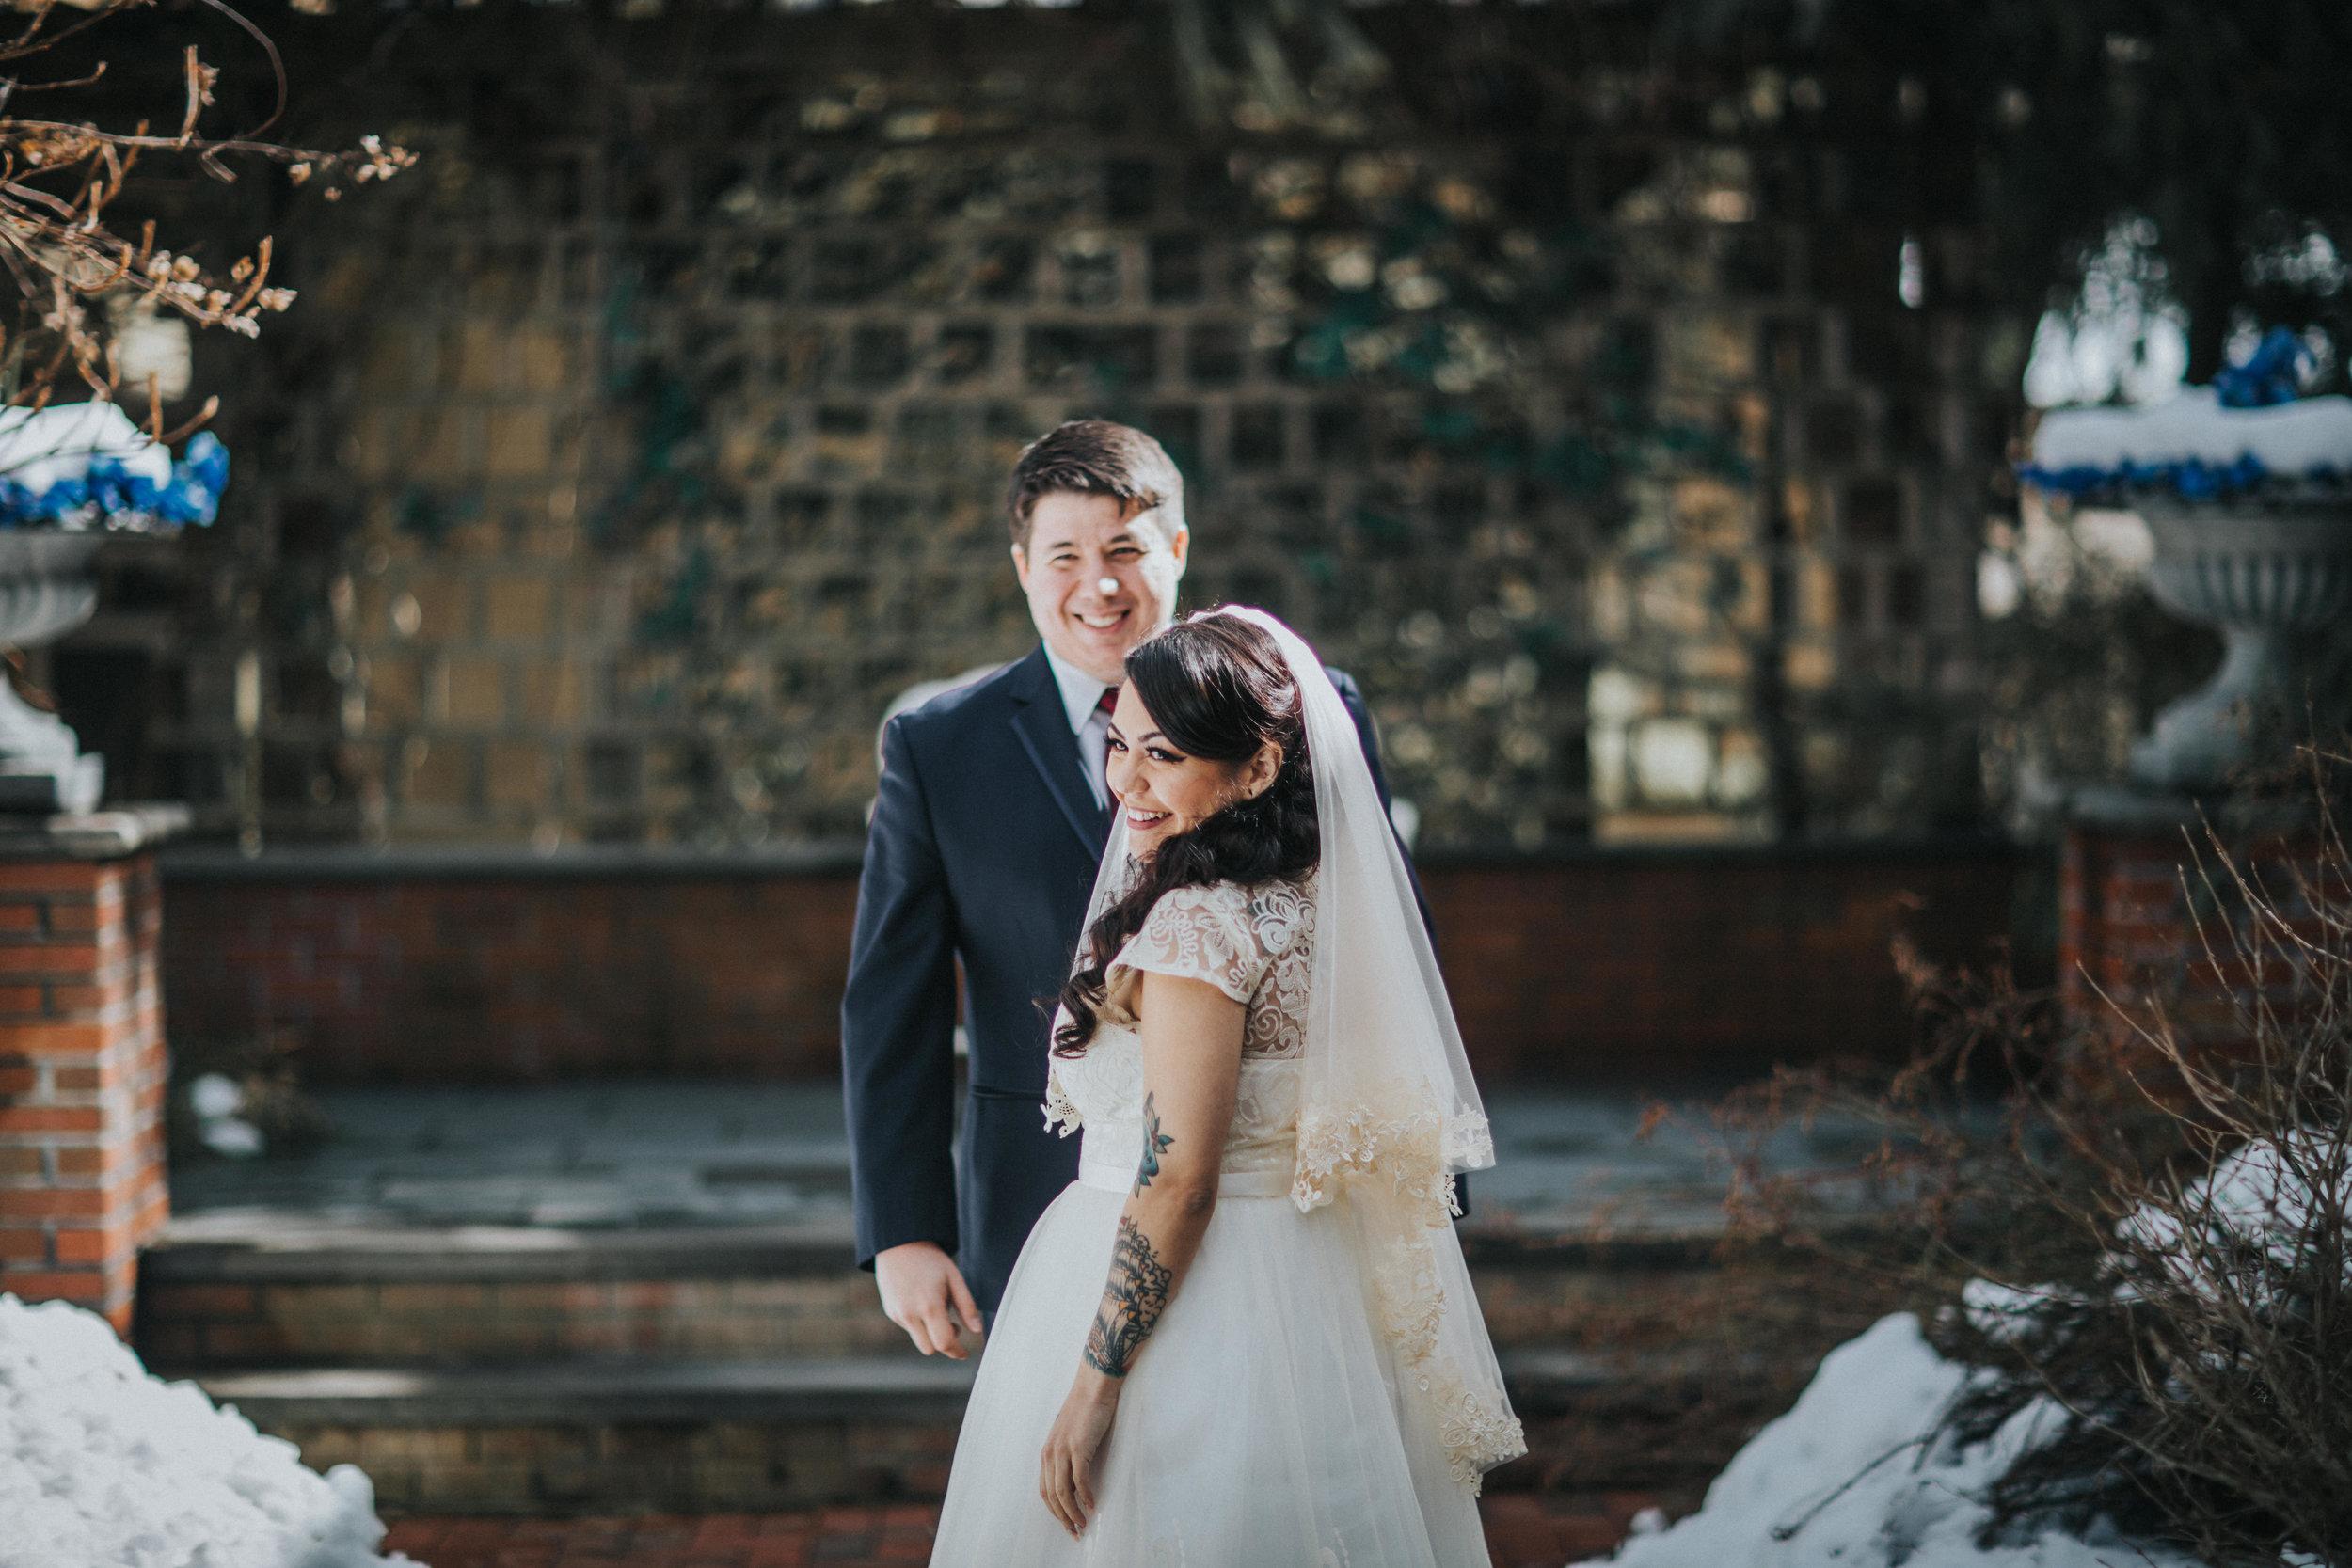 New-Jersey-Wedding-Photographer-ReceptionCenter-Valeria&Mike-First-Look-Bride&Groom (19 of 69).jpg